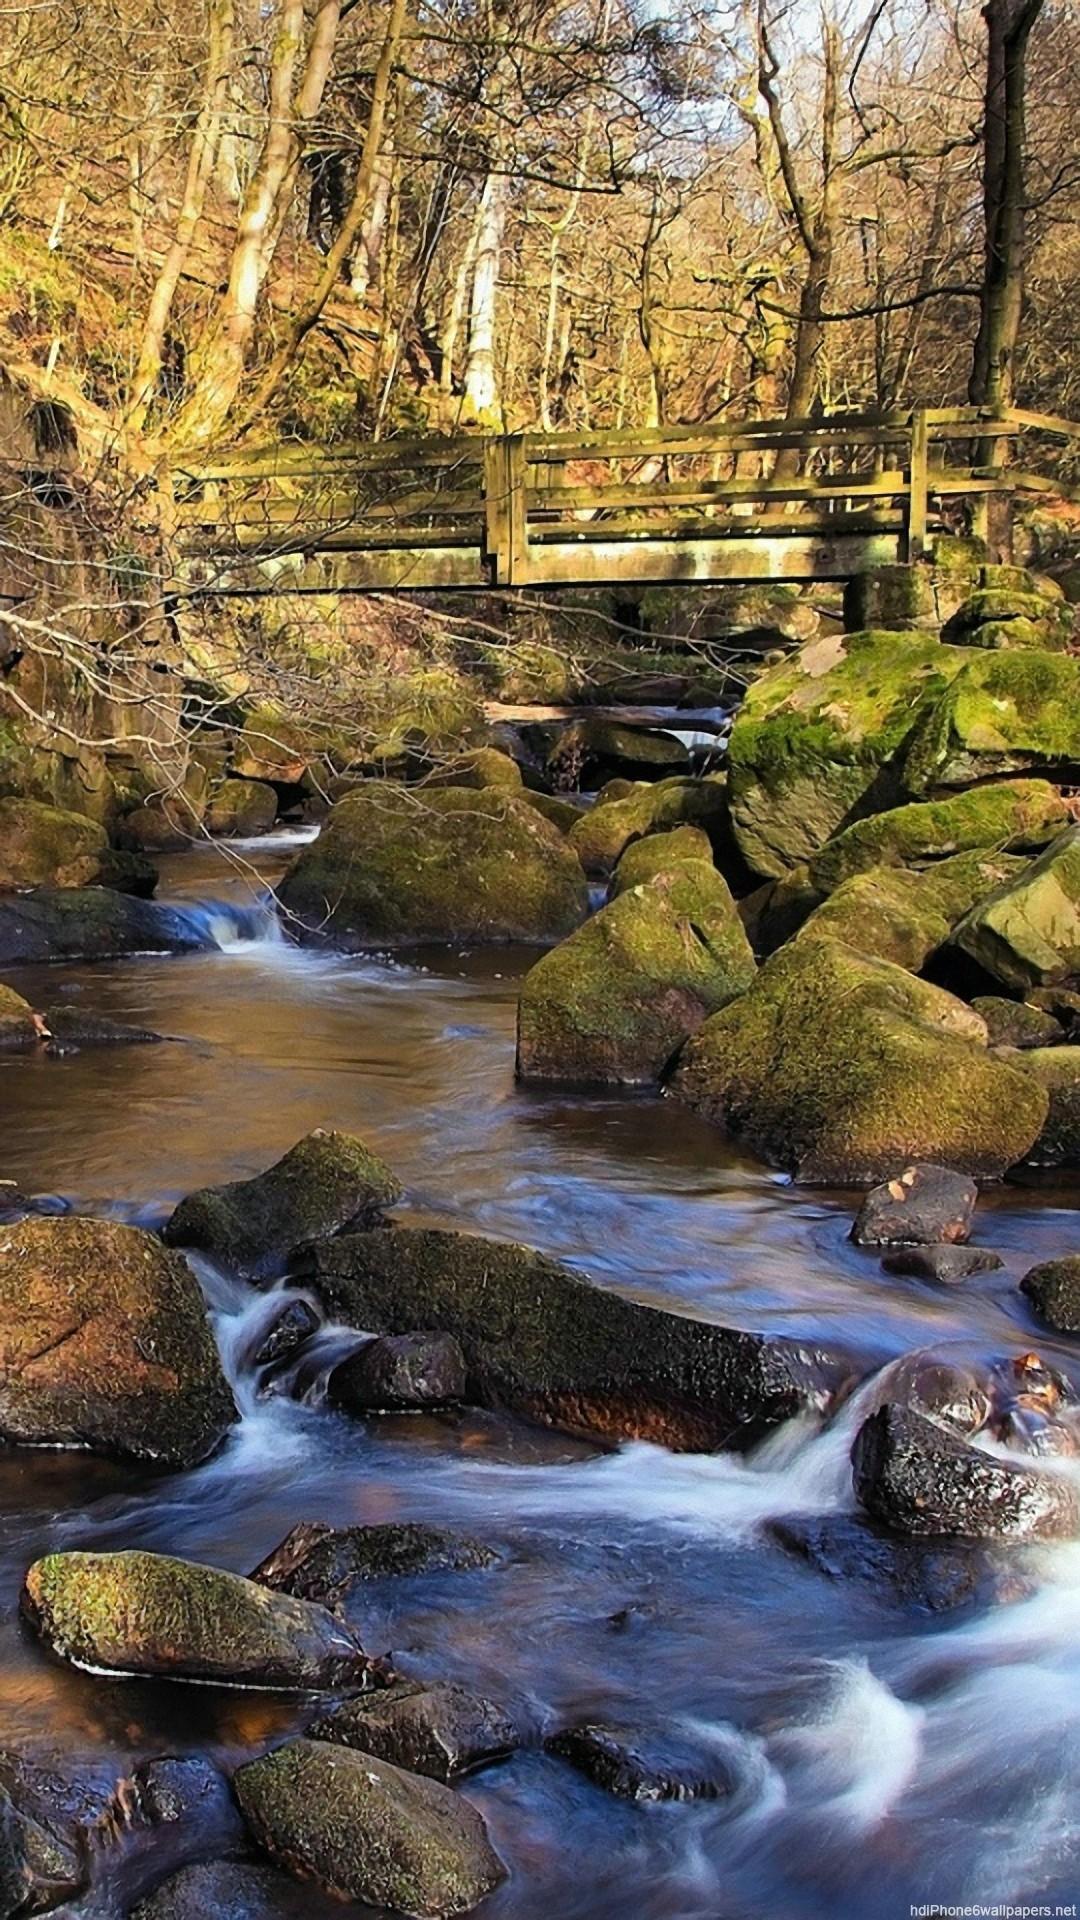 HD rock river bridge spring stream iphone 6 wallpaper